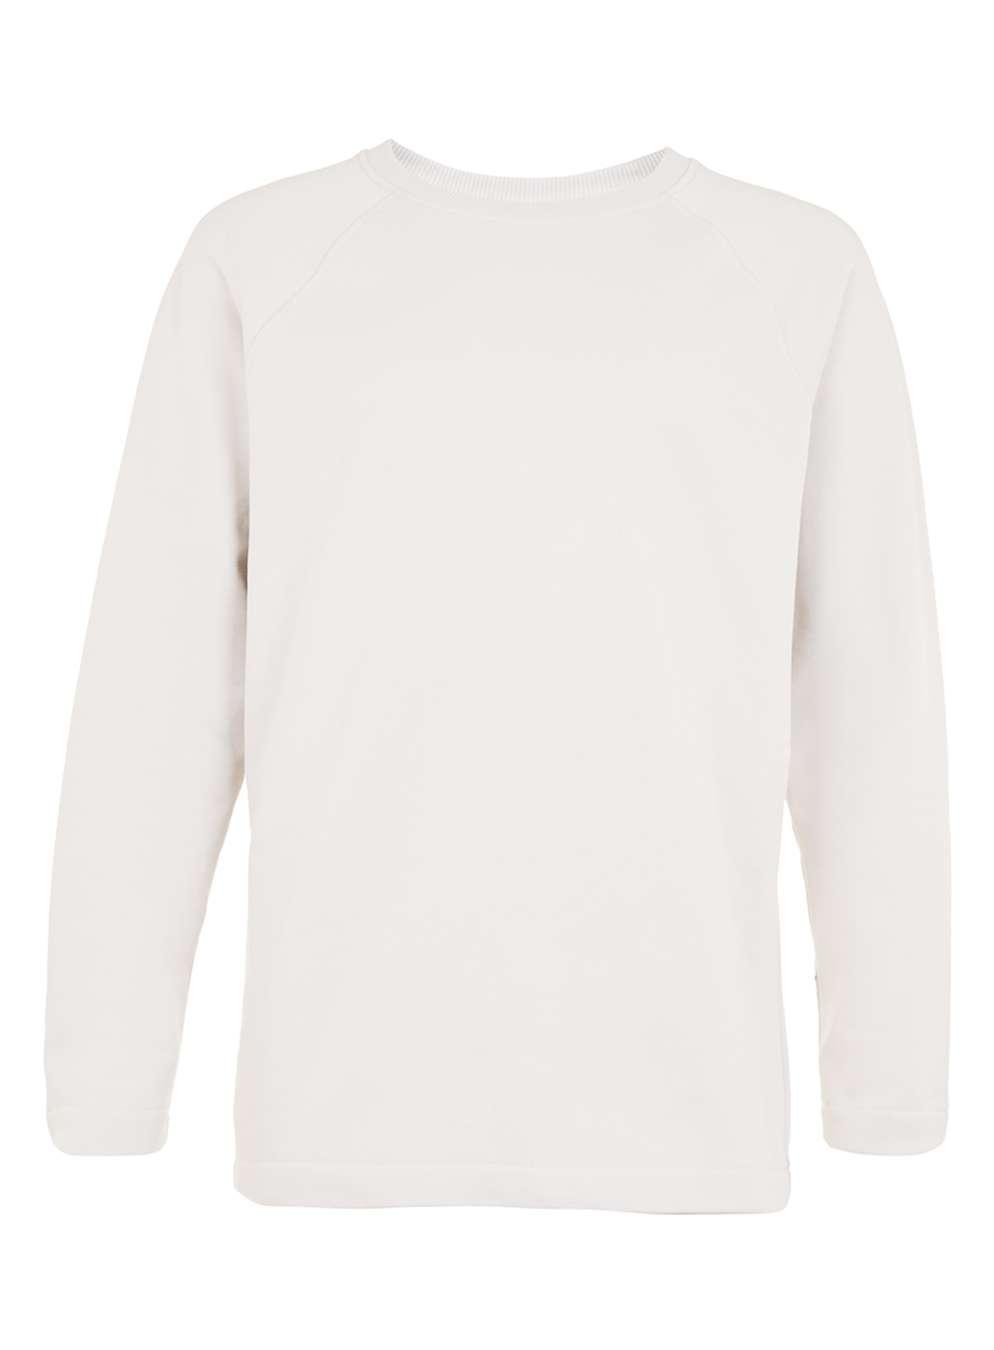 TOPMAN PREMIUM Stone Sweatshirt , £40